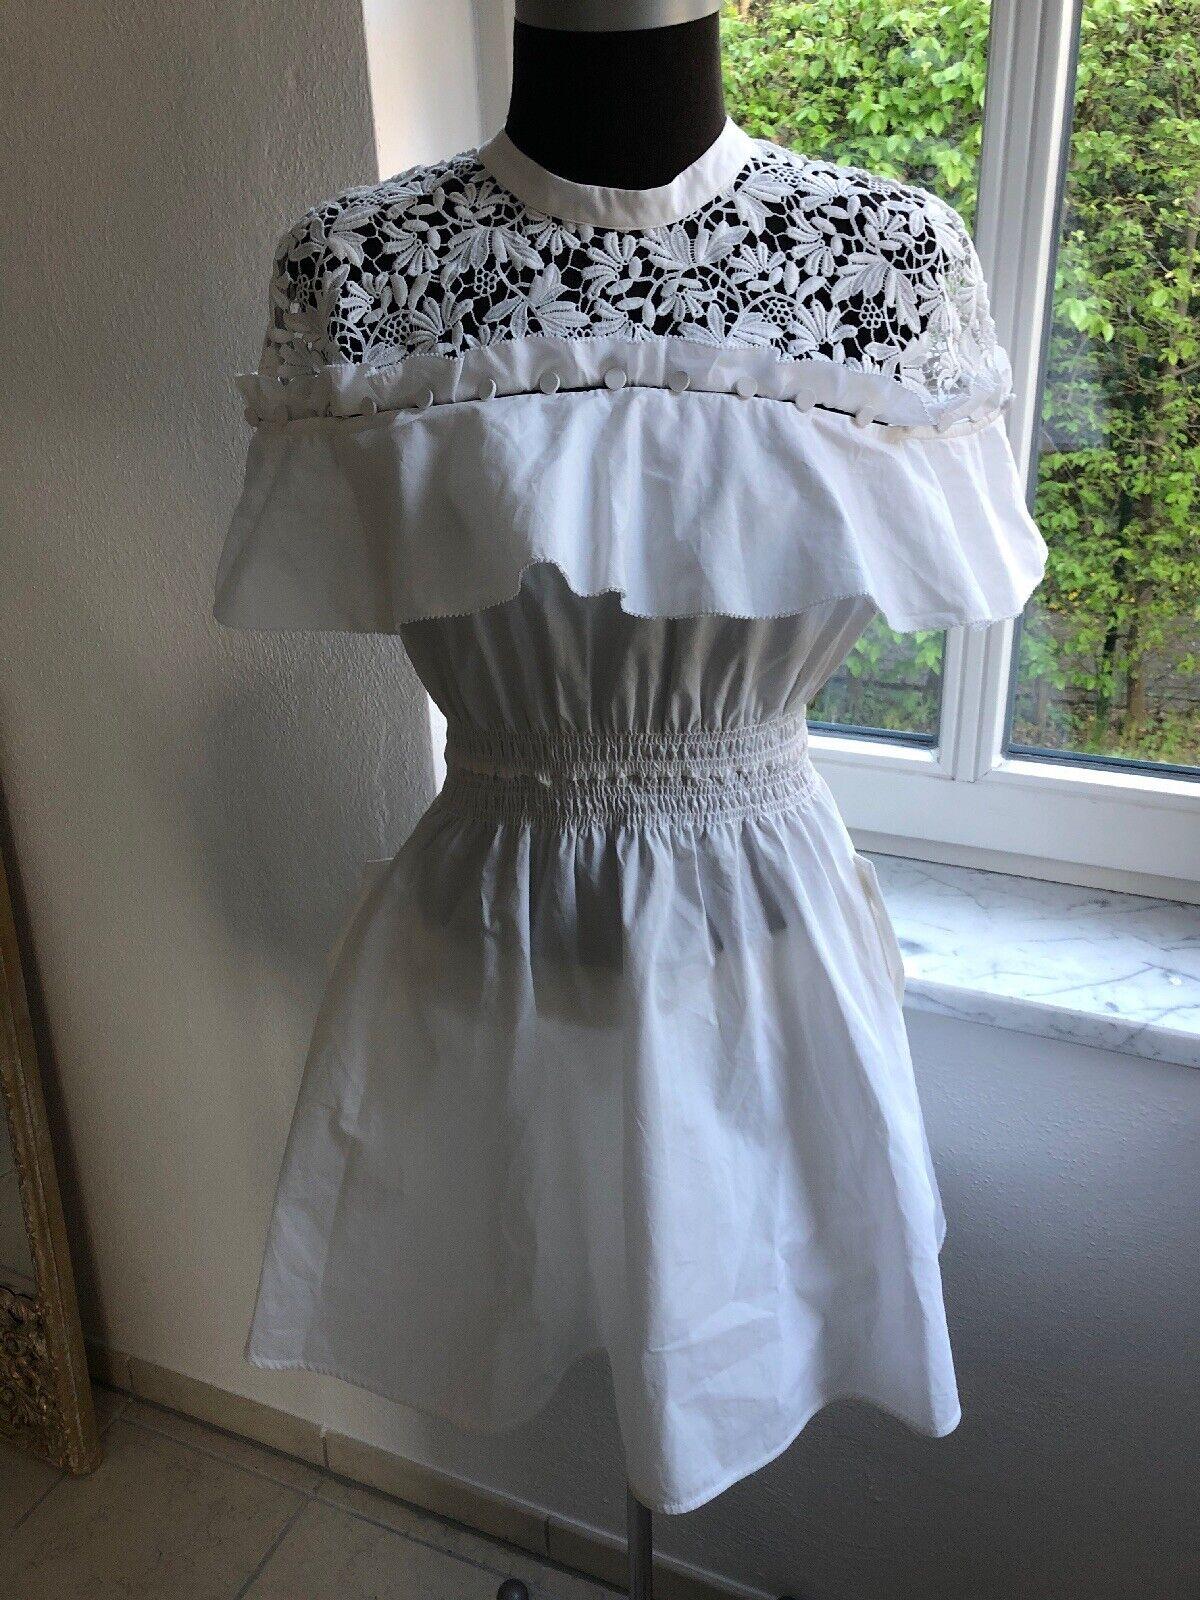 fa48b5a825bd68 100% OriginalSelf-portraitKleid mini Popelin, 1 X Getragen dressUK12Weiß  nplegr1026-neue Kleidung